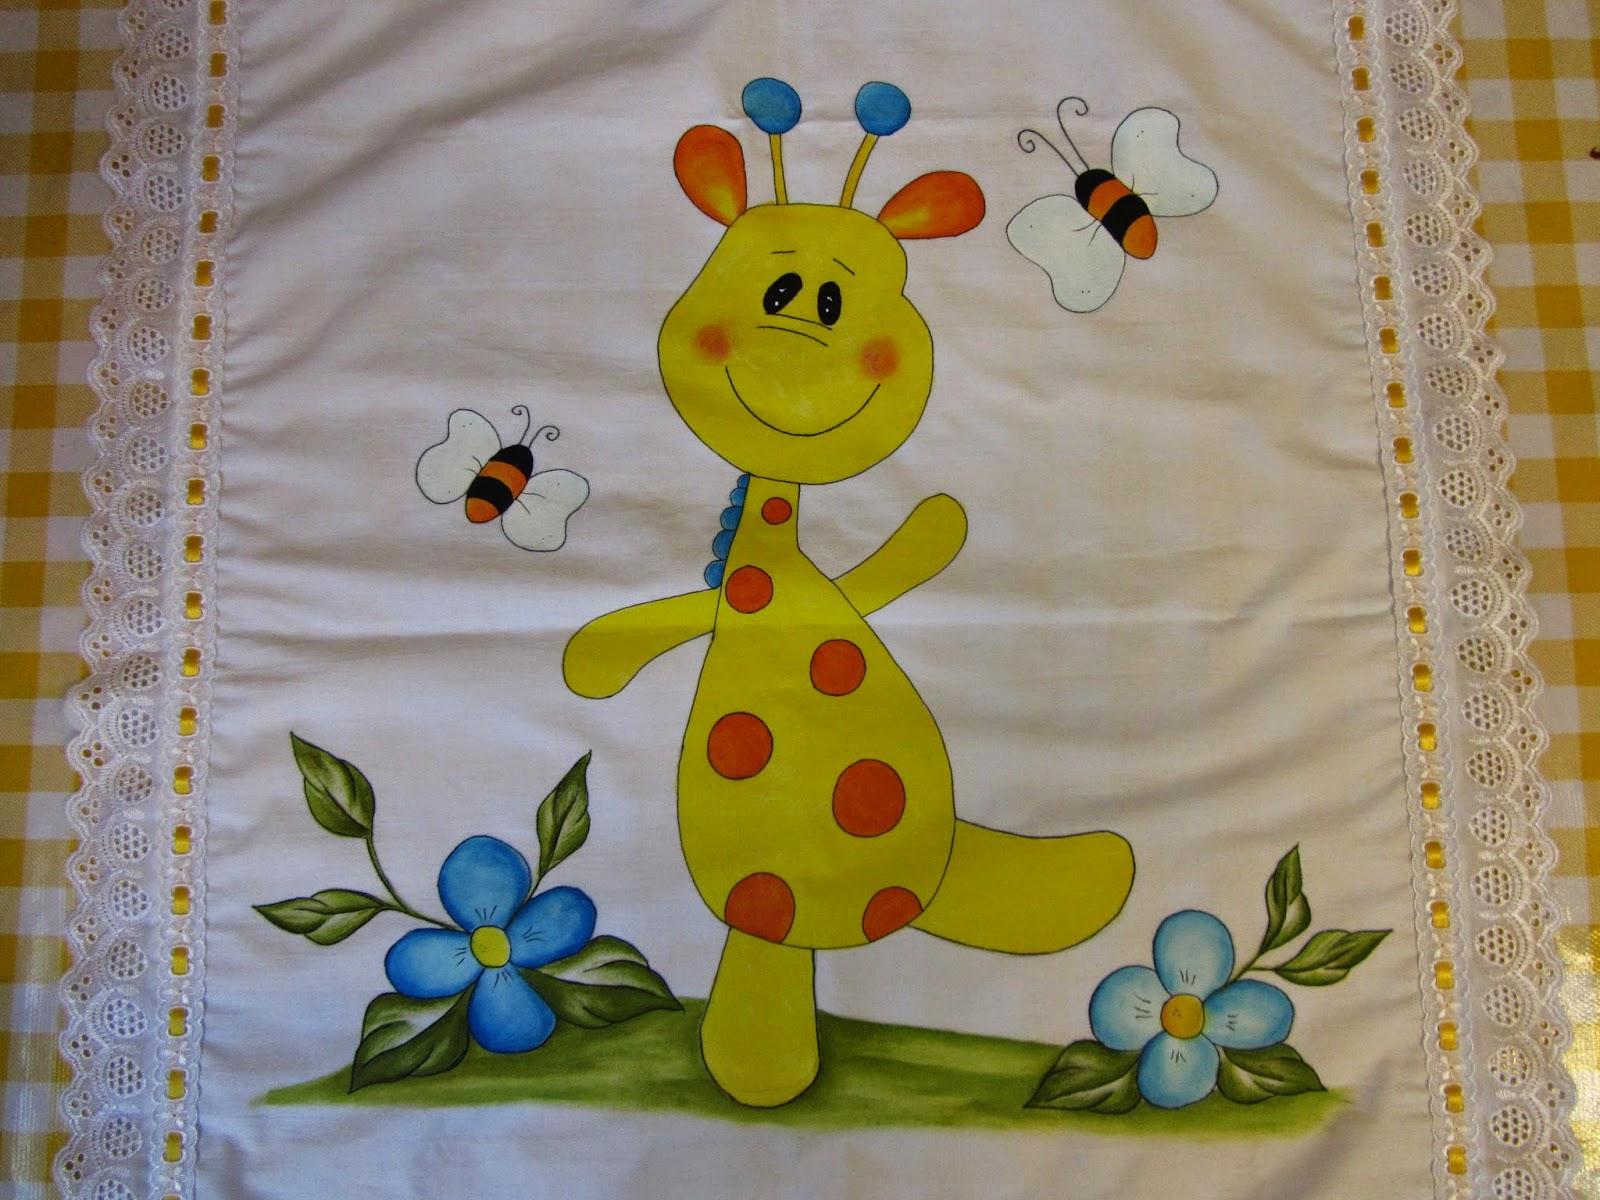 Alegr a en las flores con pinceladas de colores jirafa - Dibujos para sabanitas de bebe ...